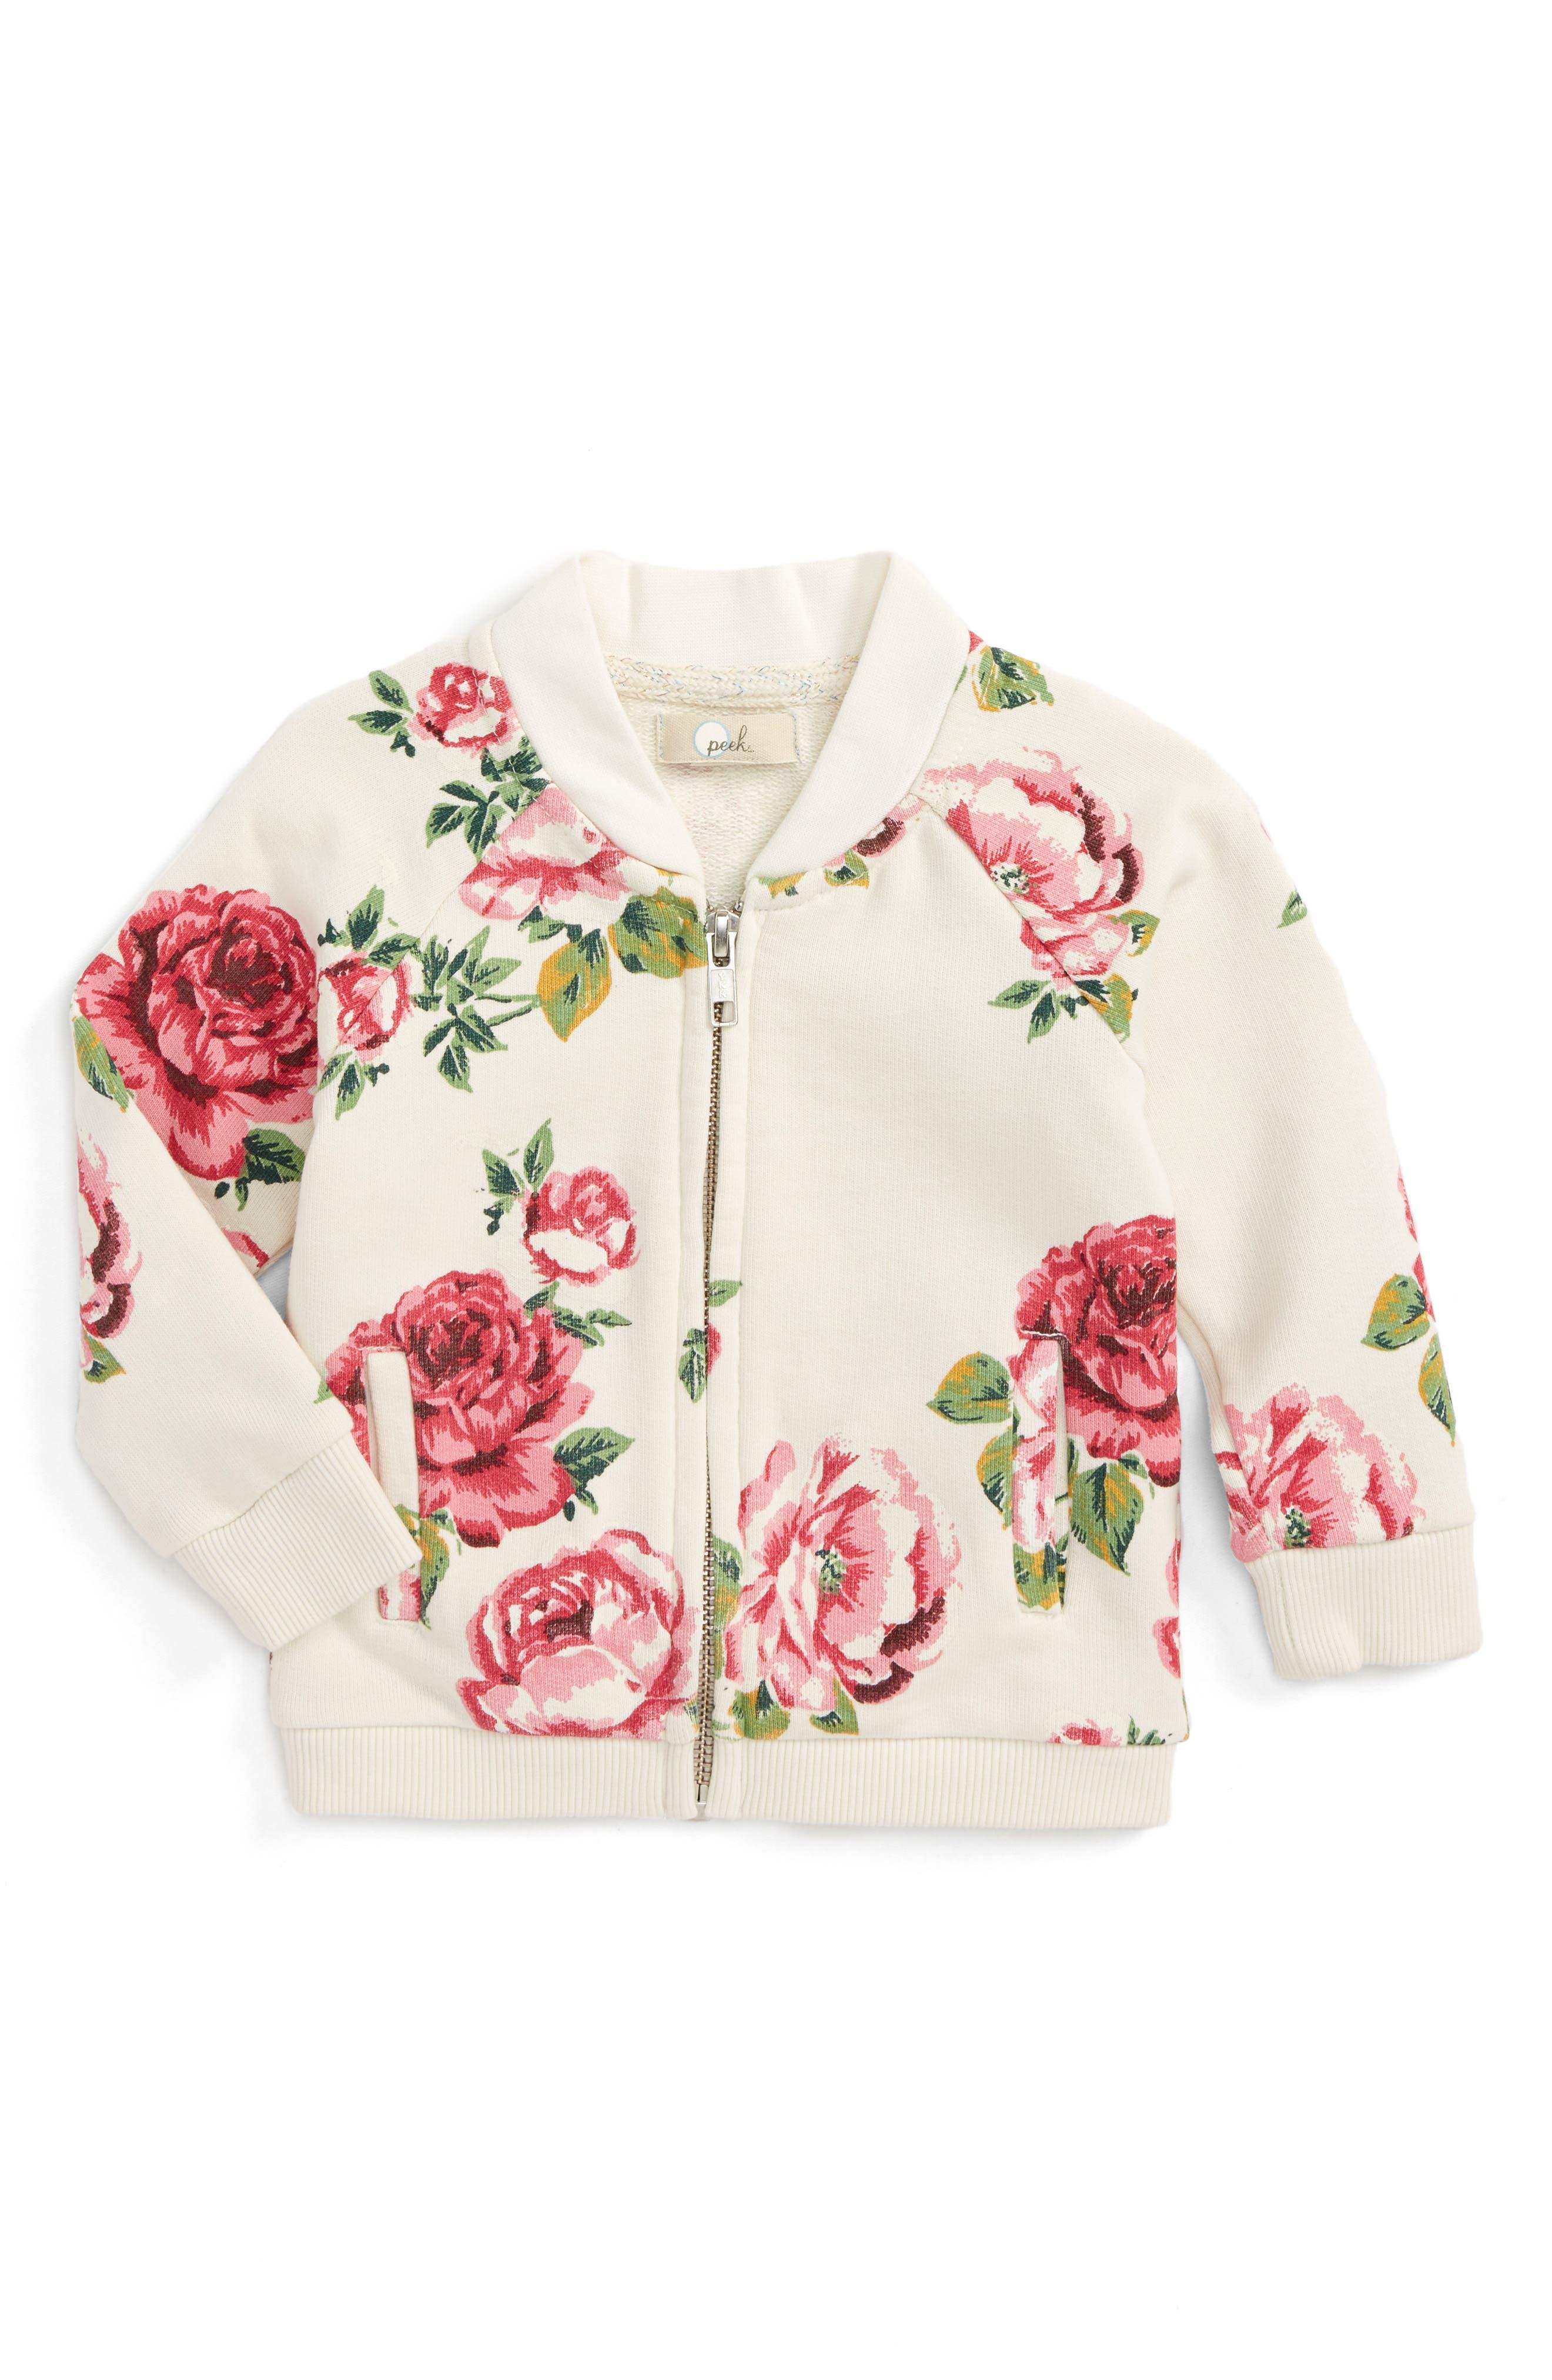 Peek Floral Bomber Jacket (Baby Girls)